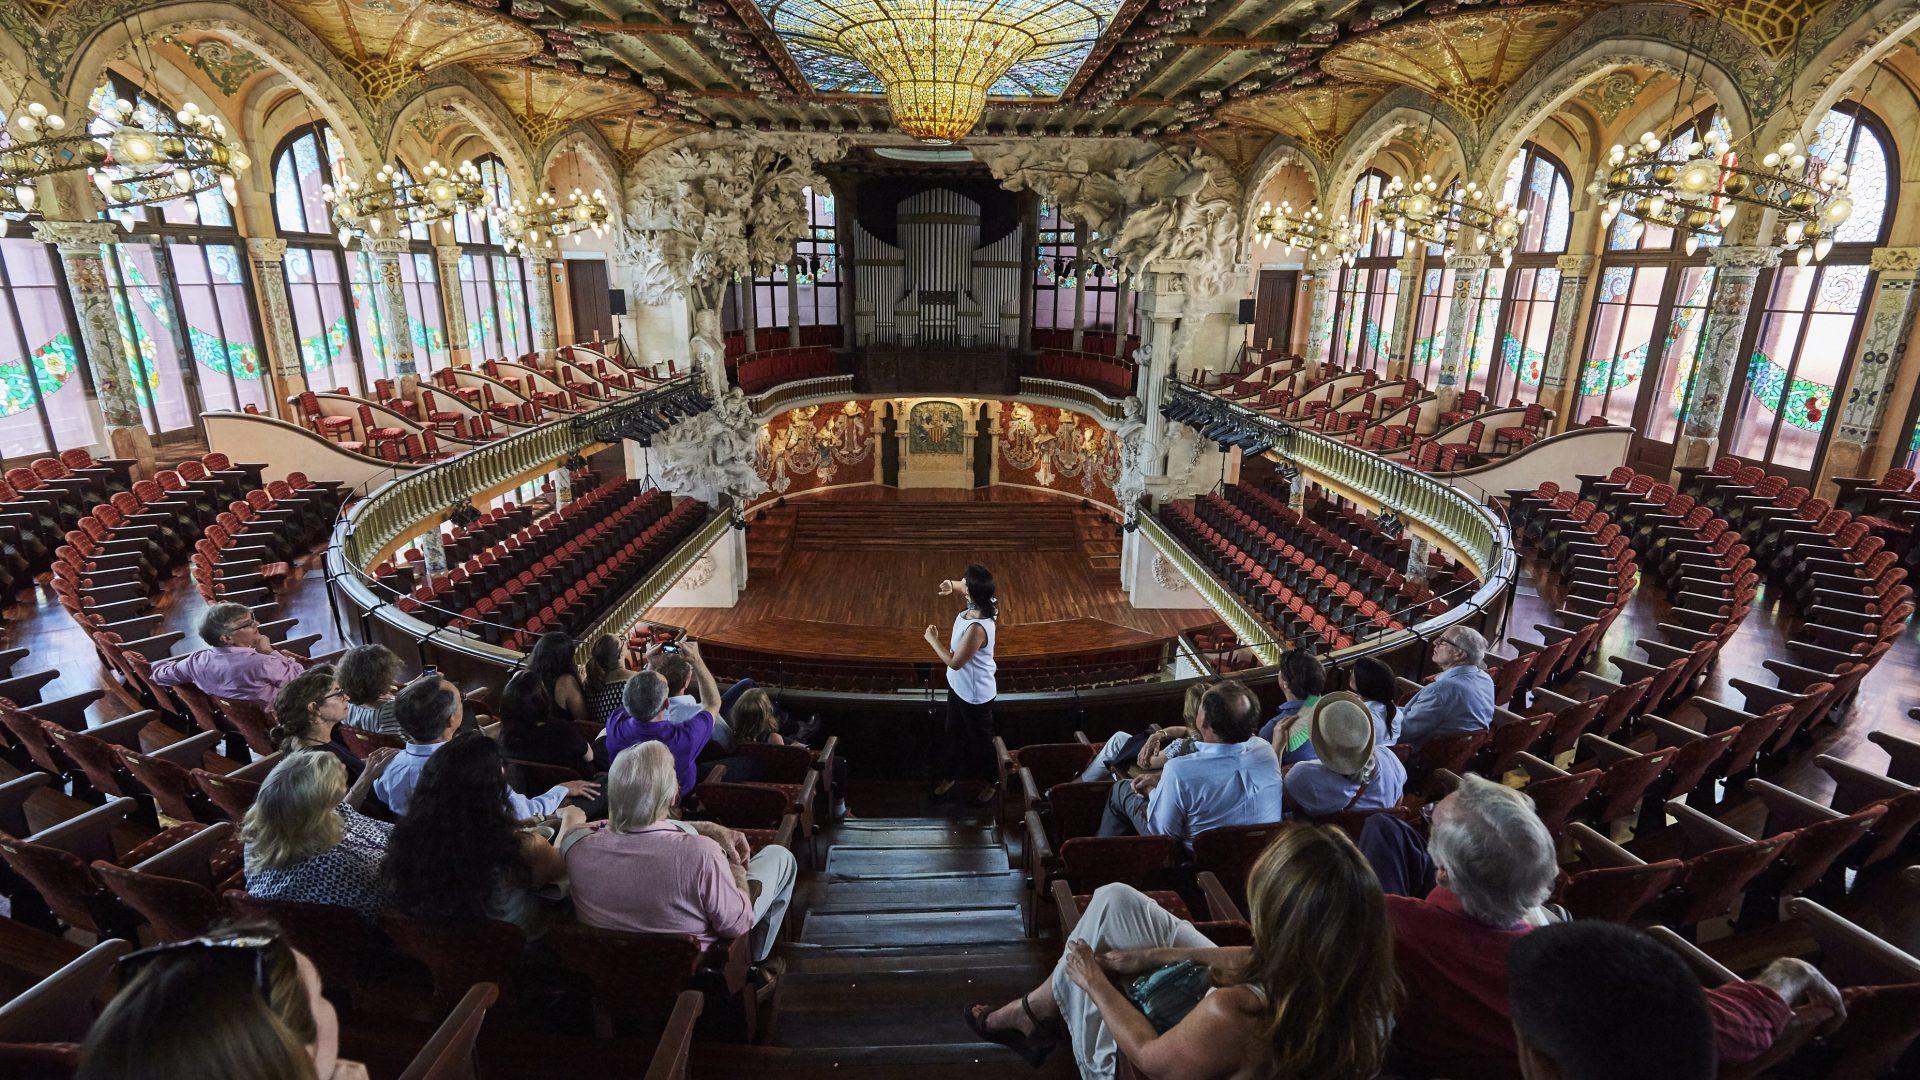 Historical concert venue in Barcelona